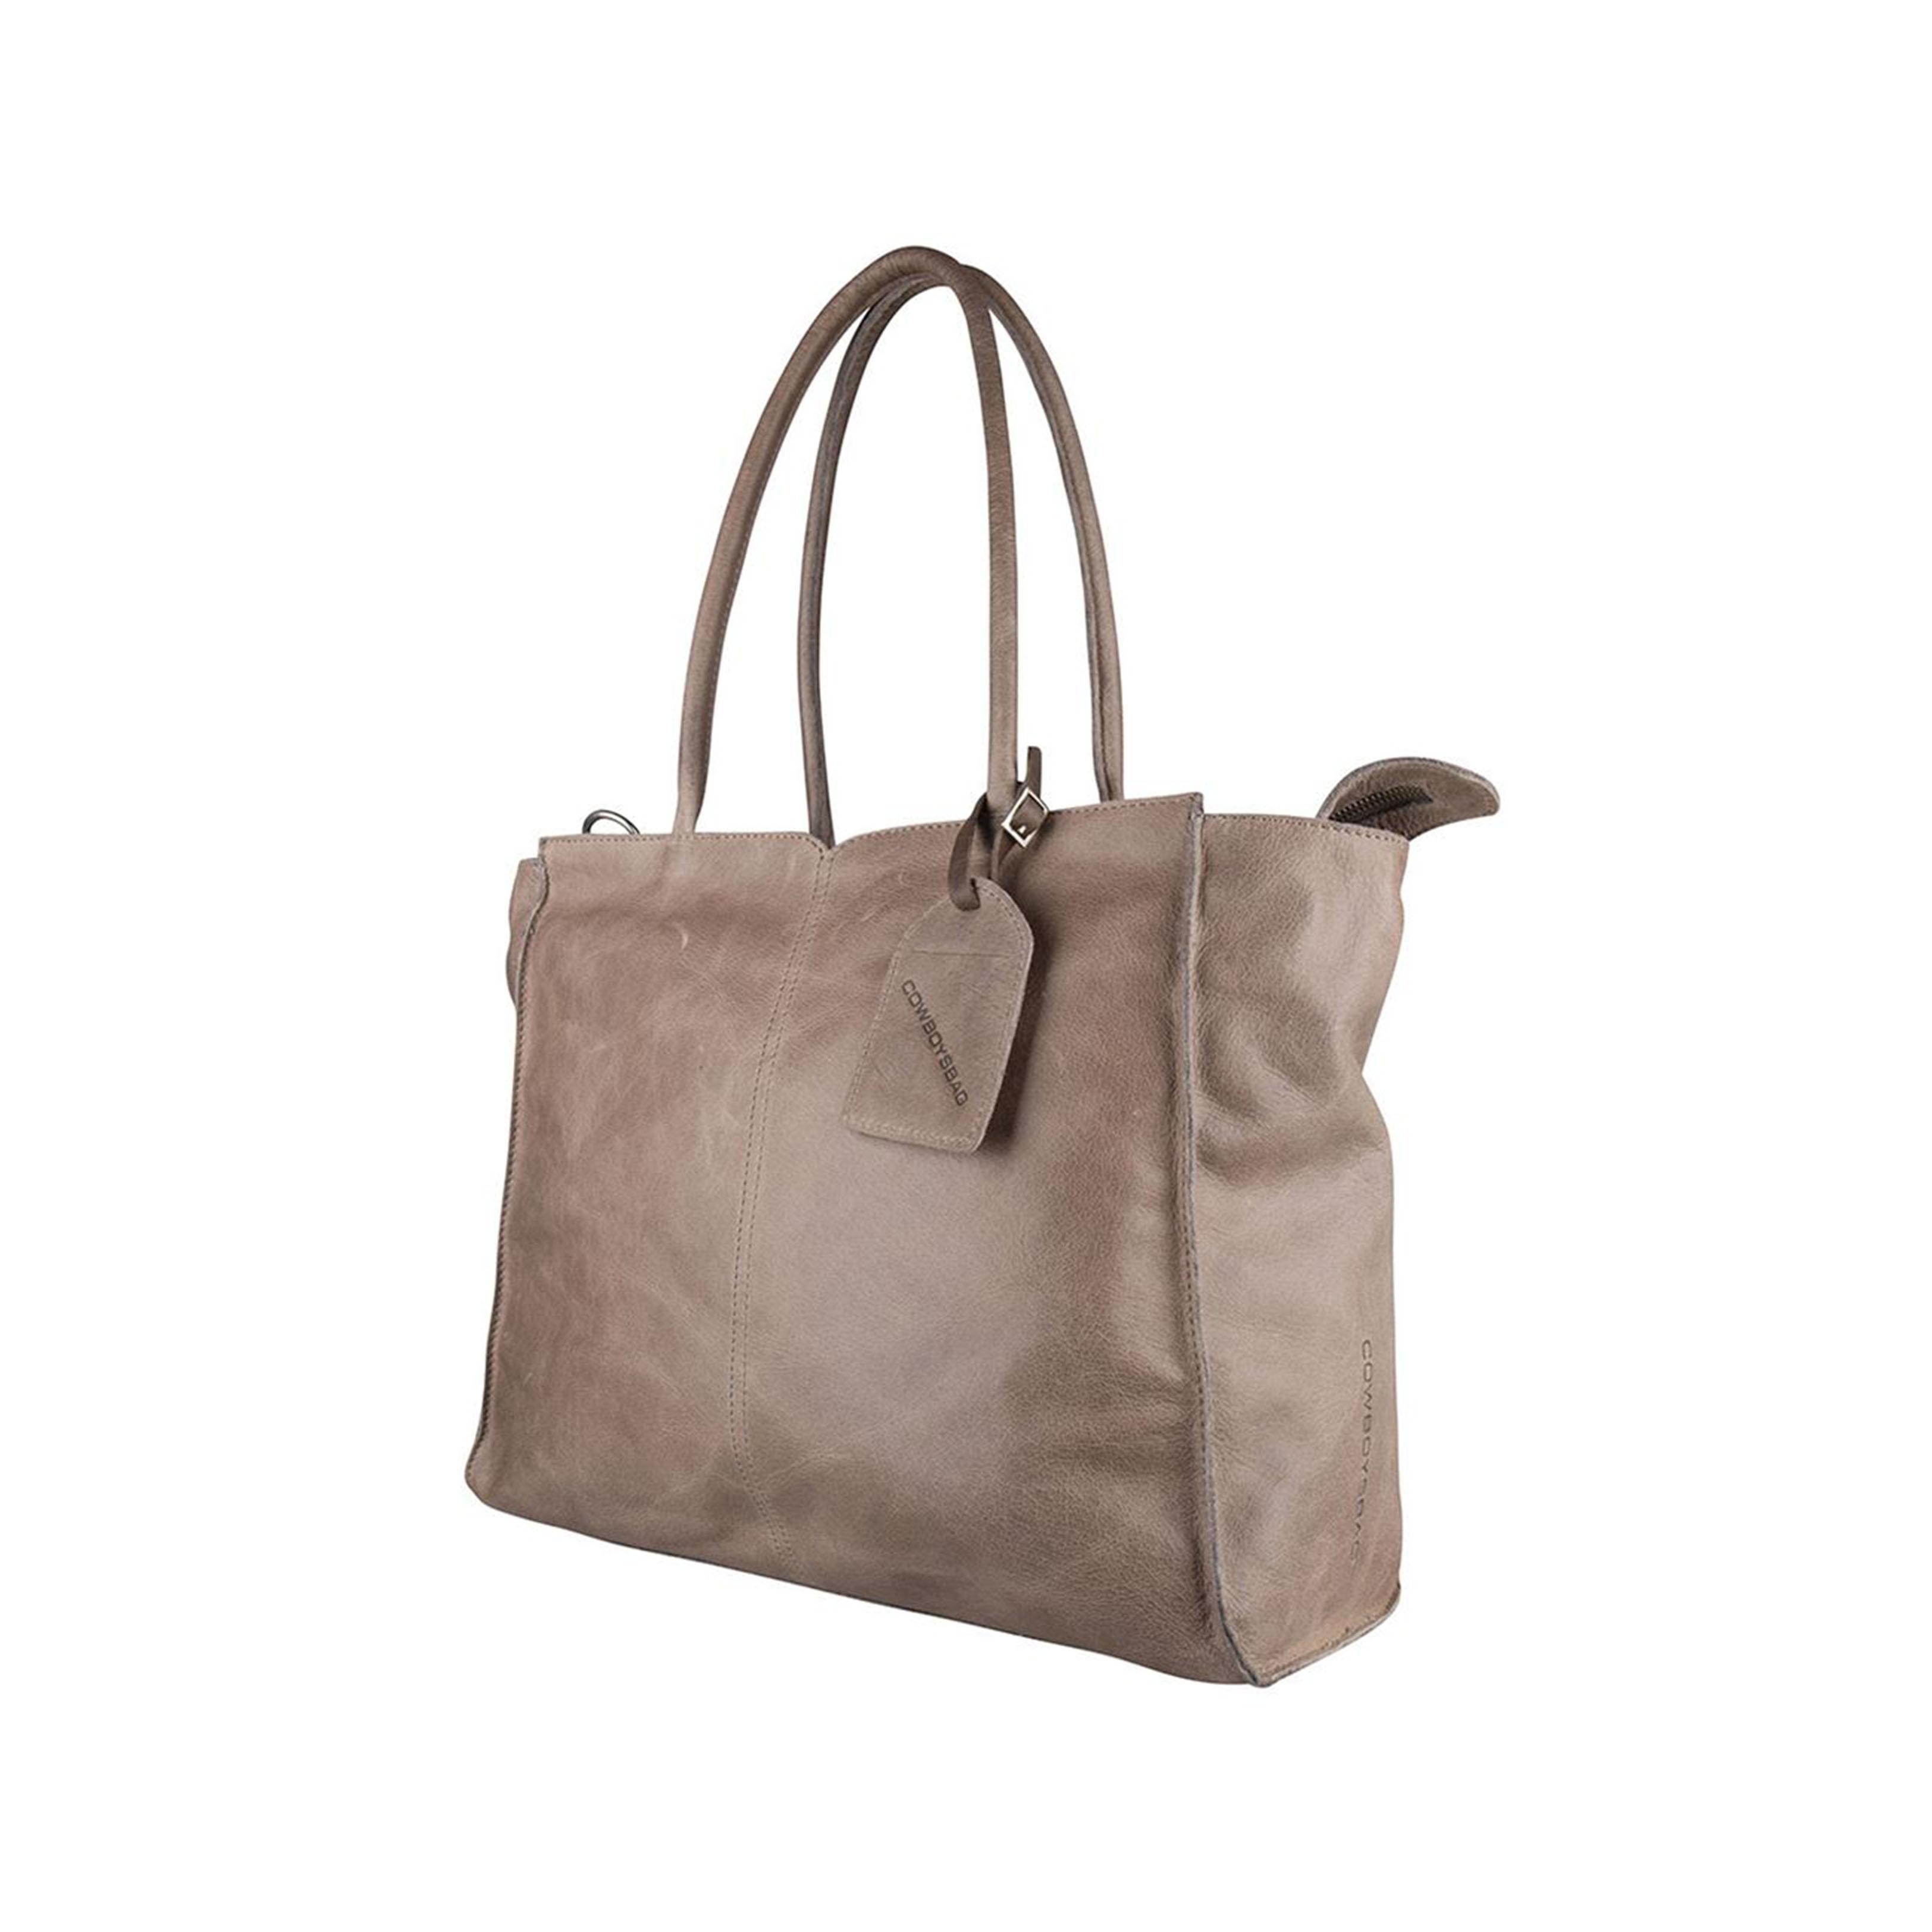 super popular 7db5b 99fa1 COWBOYSBAG Damen Leder Tasche Laptoptasche Laptop Bag Reno 15.6 Inch  Elephantgrey Grau 2197